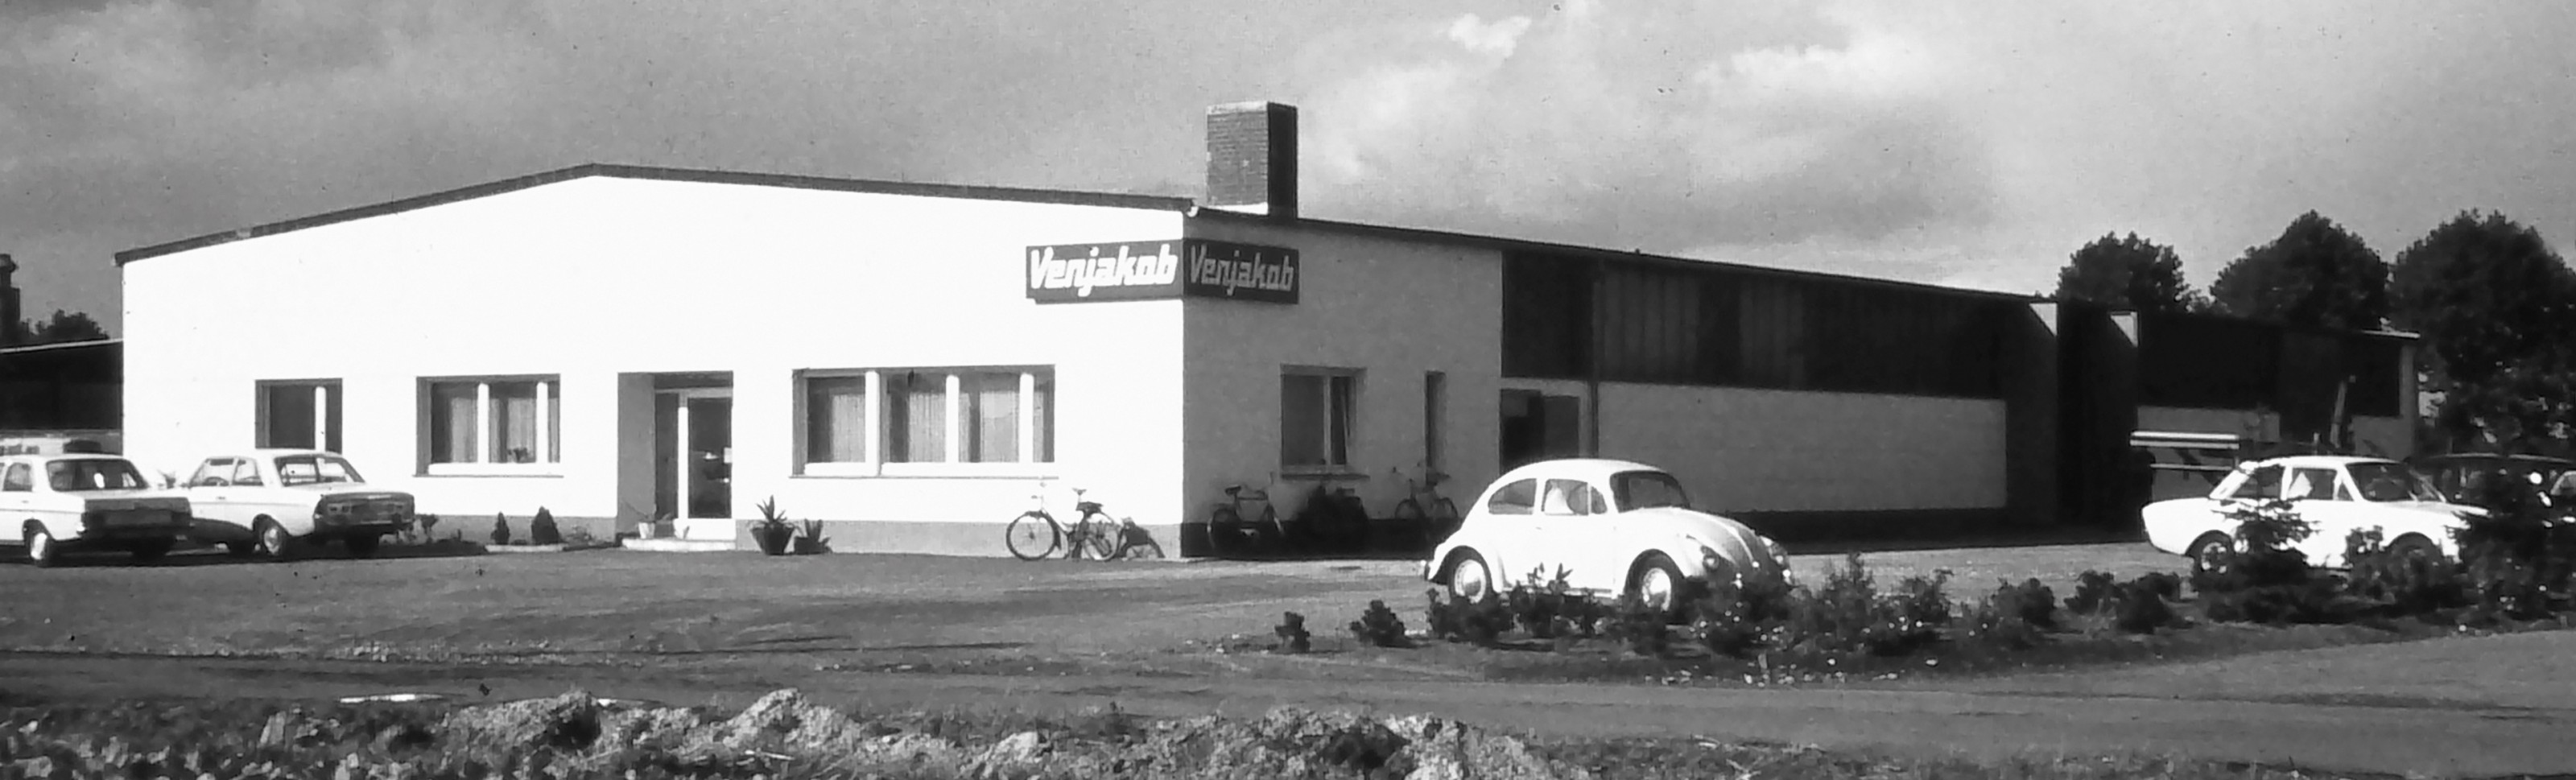 Venjakob Heqdquarter 1975